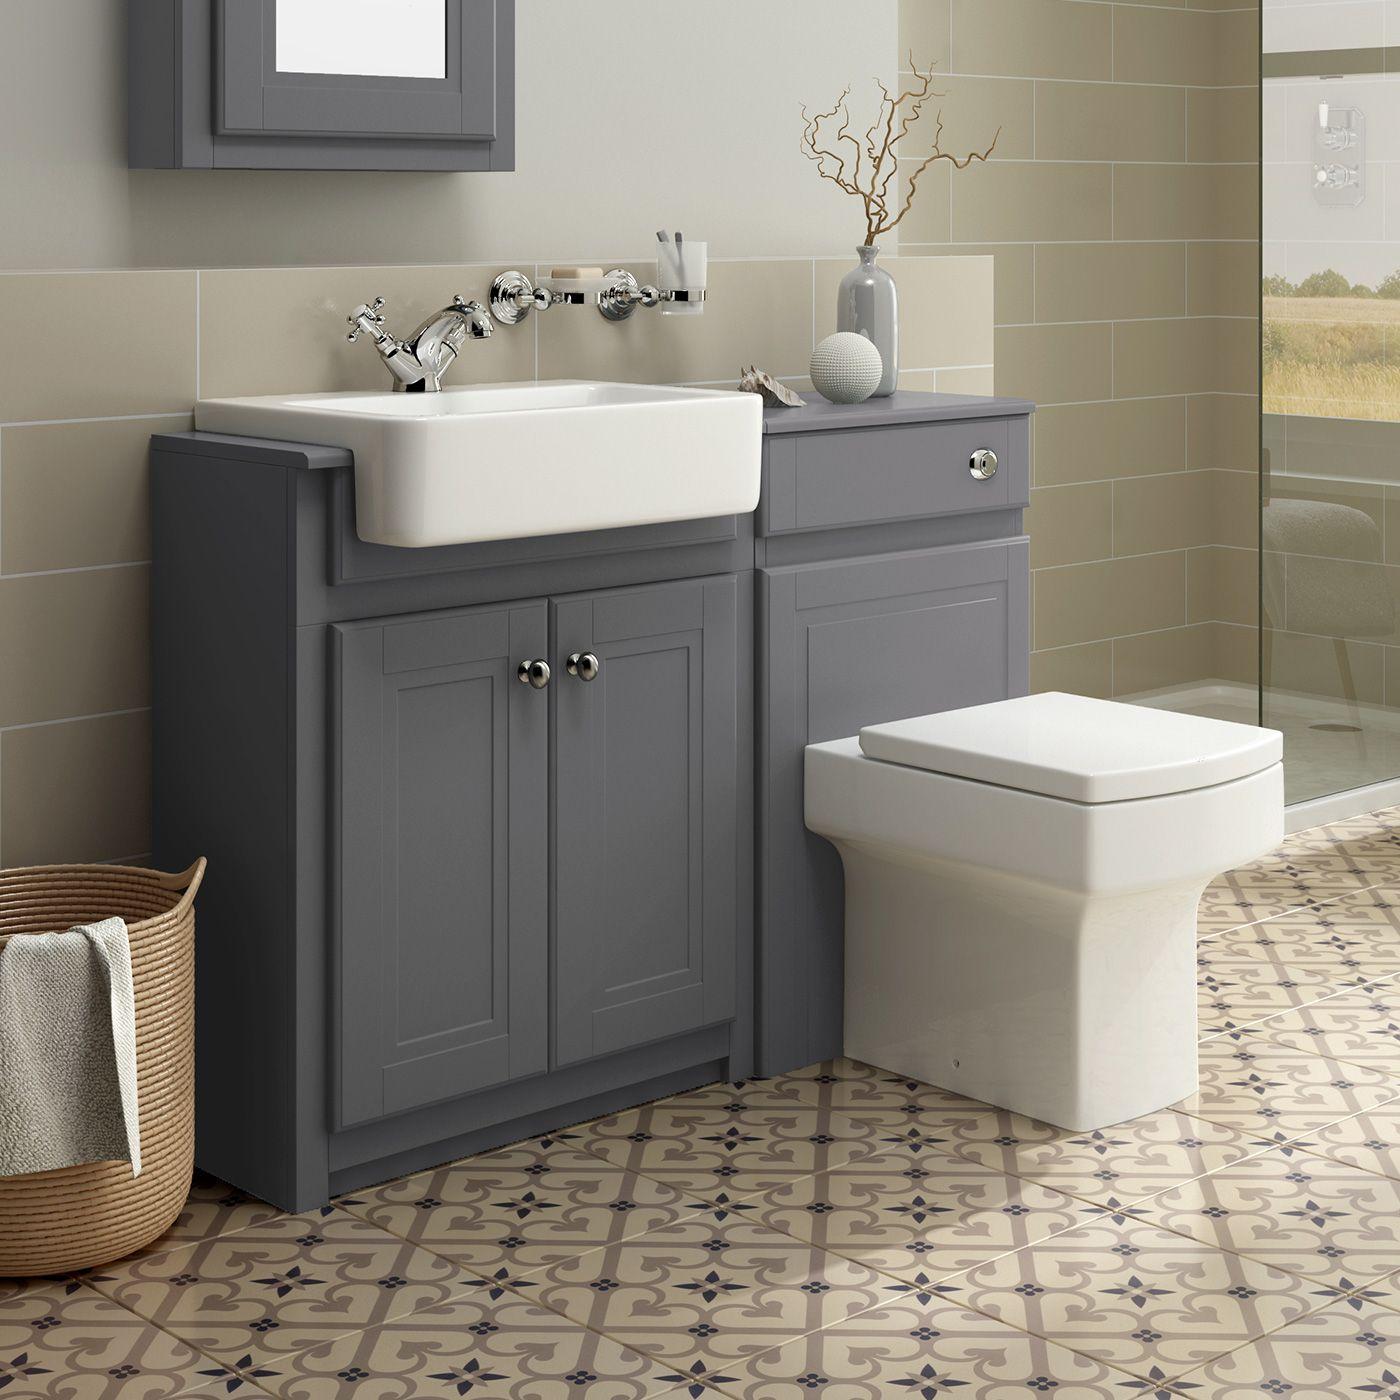 Grey Bathroom Sink And Toilet Units Small Bathroom Design Ideas